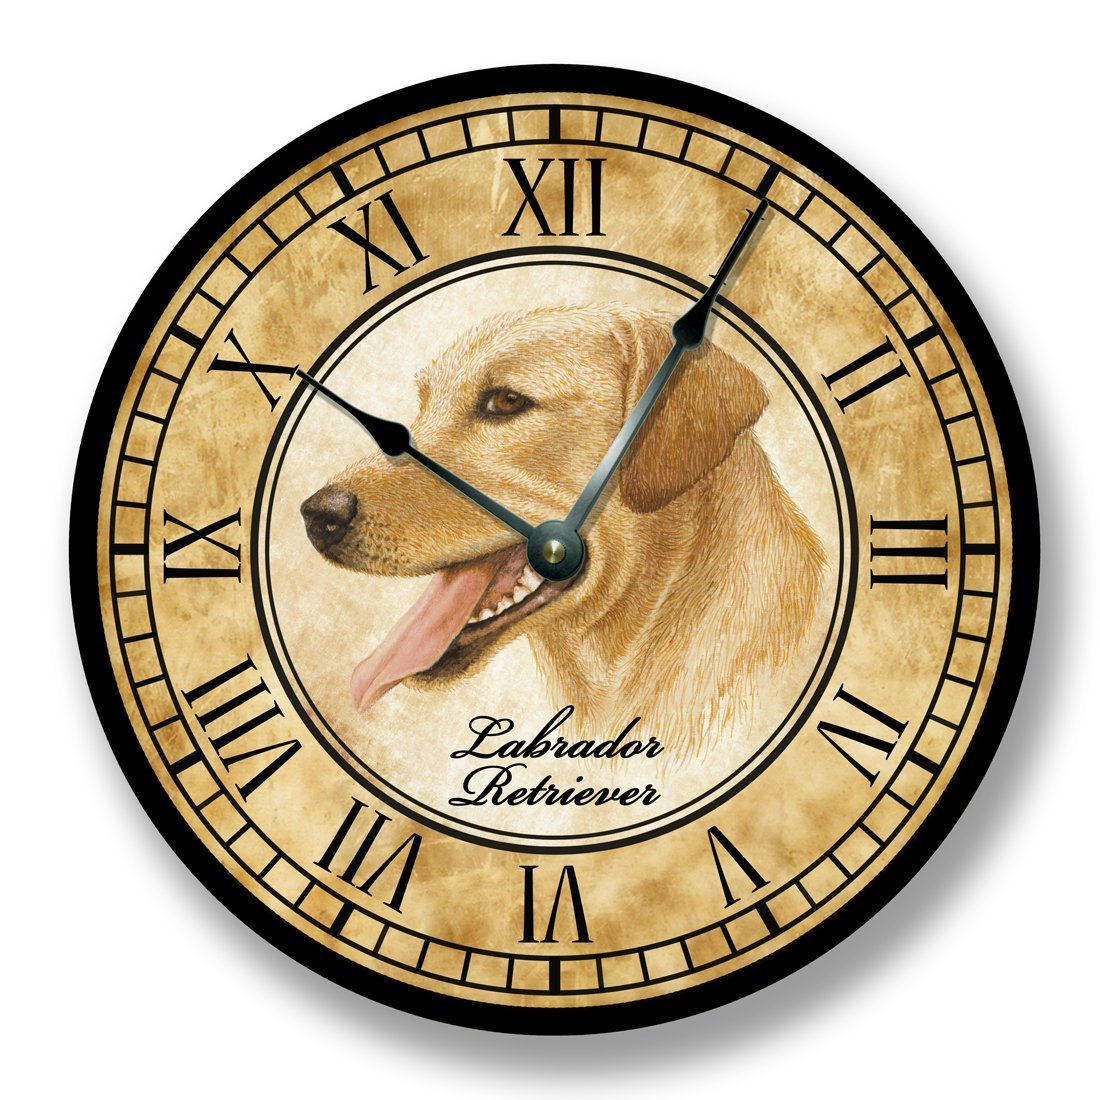 Cheap Wall Clock Dog, find Wall Clock Dog deals on line at Alibaba.com